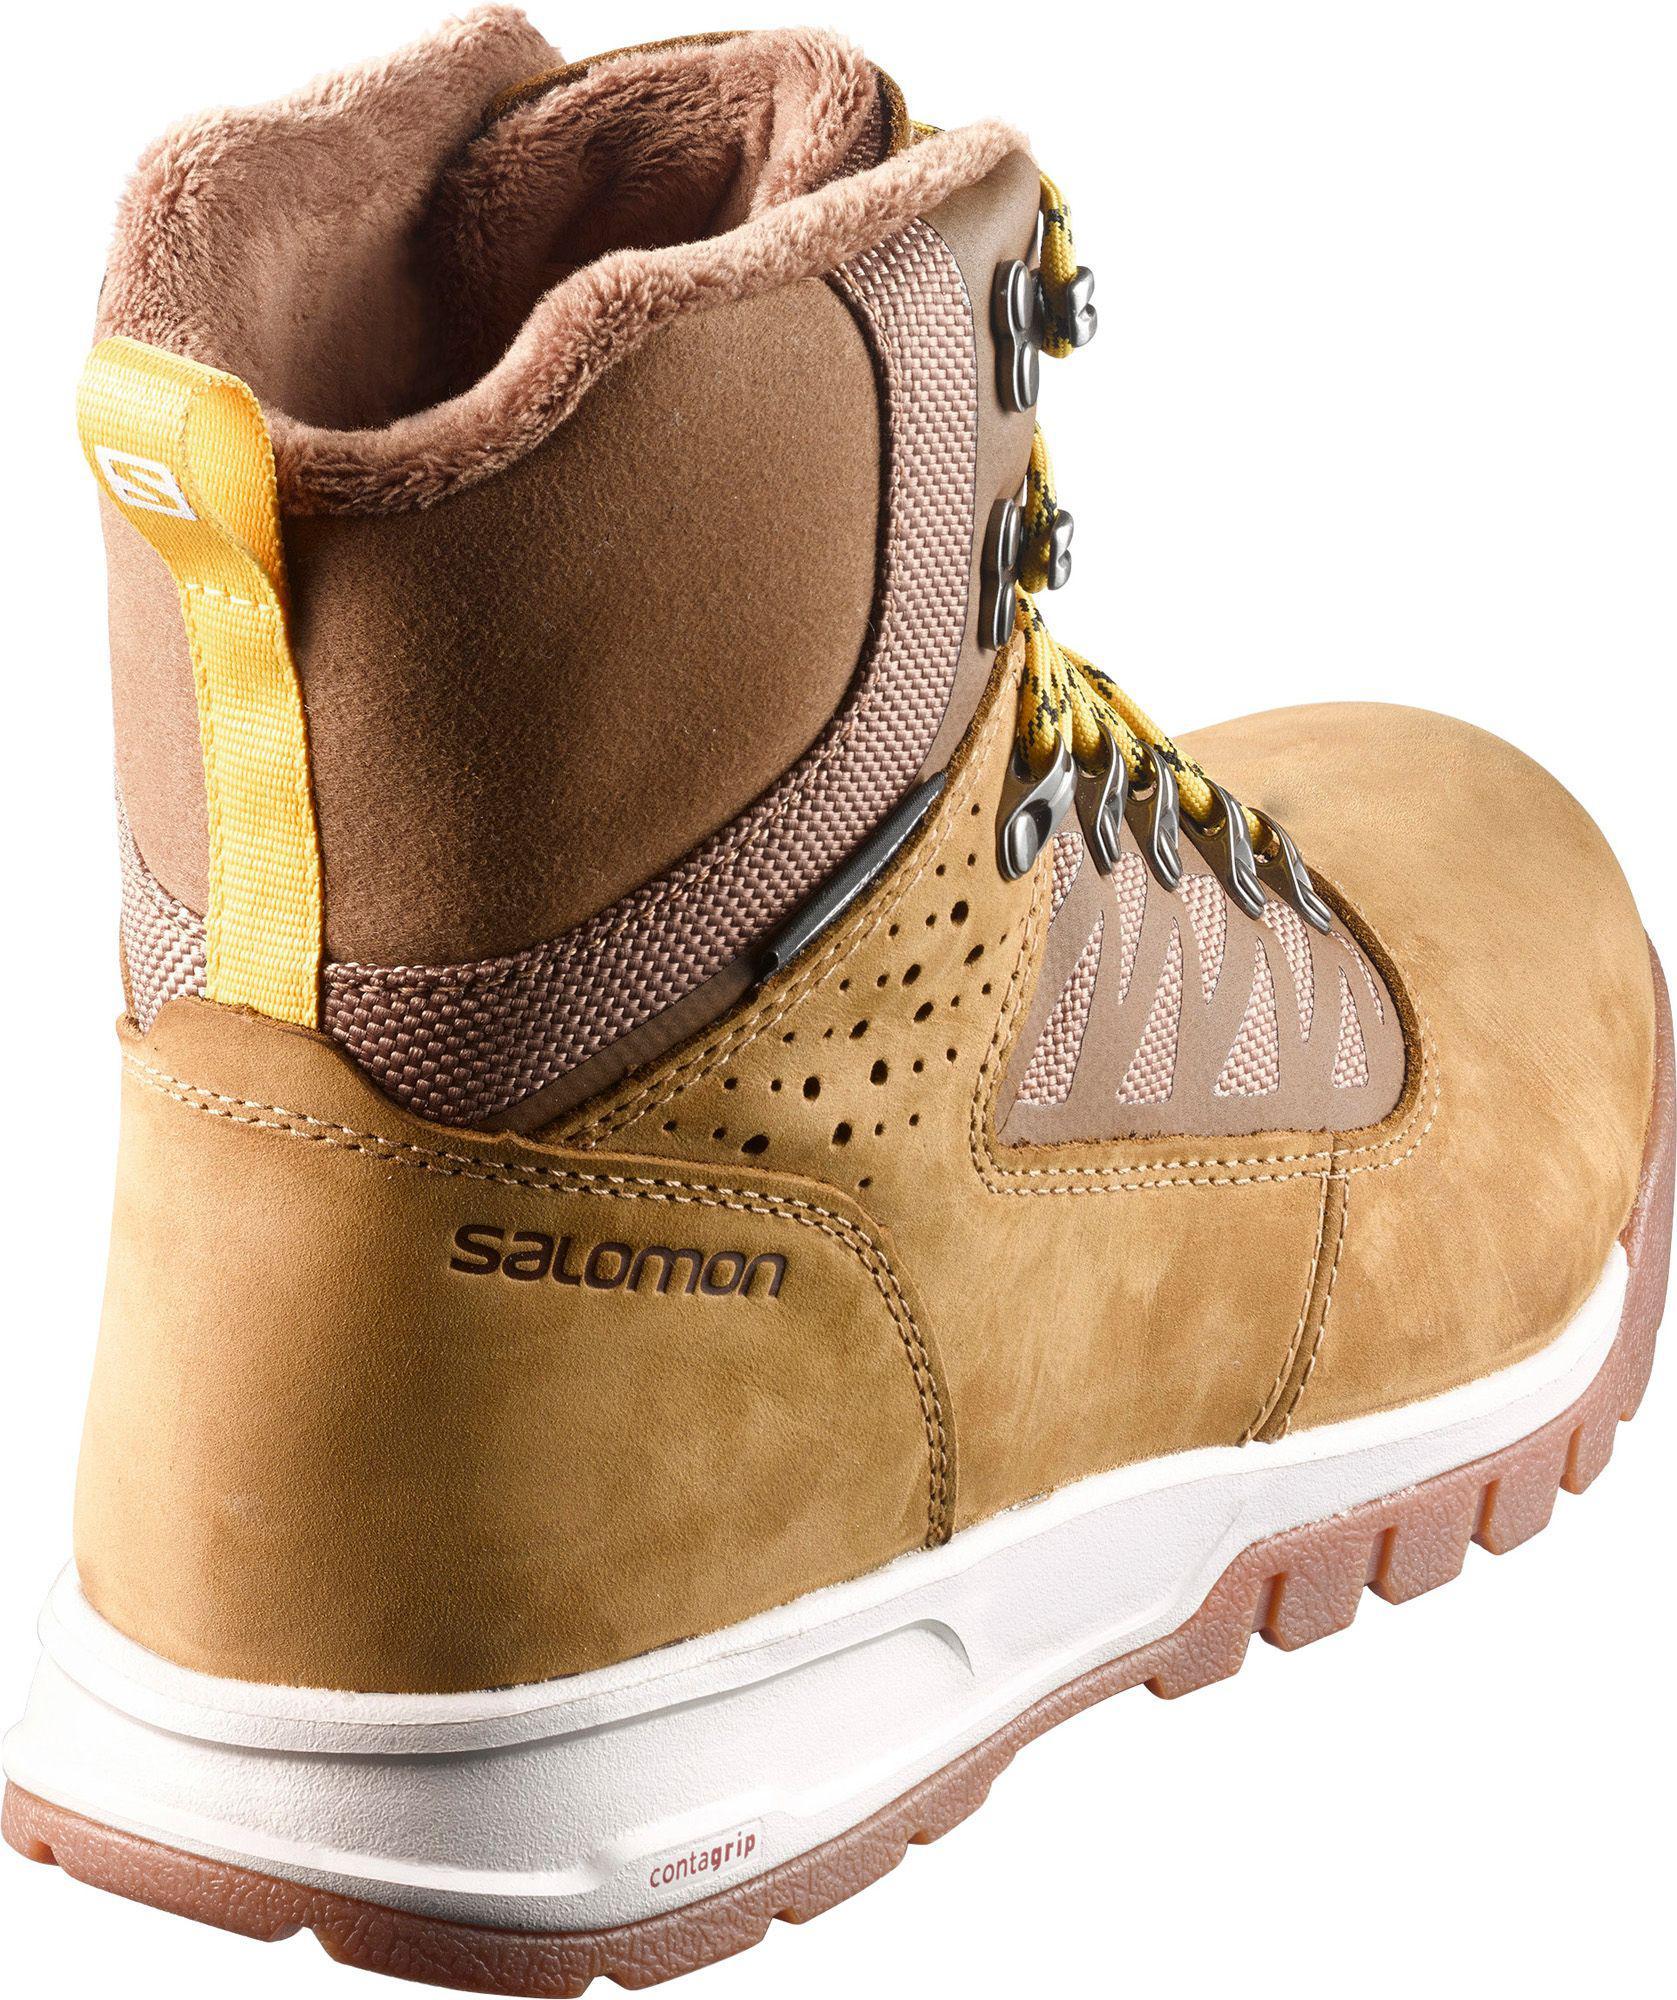 051ab47623 Lyst - Yves Salomon Utility Pro Ts Cs 200g Waterproof Winter Boots ...